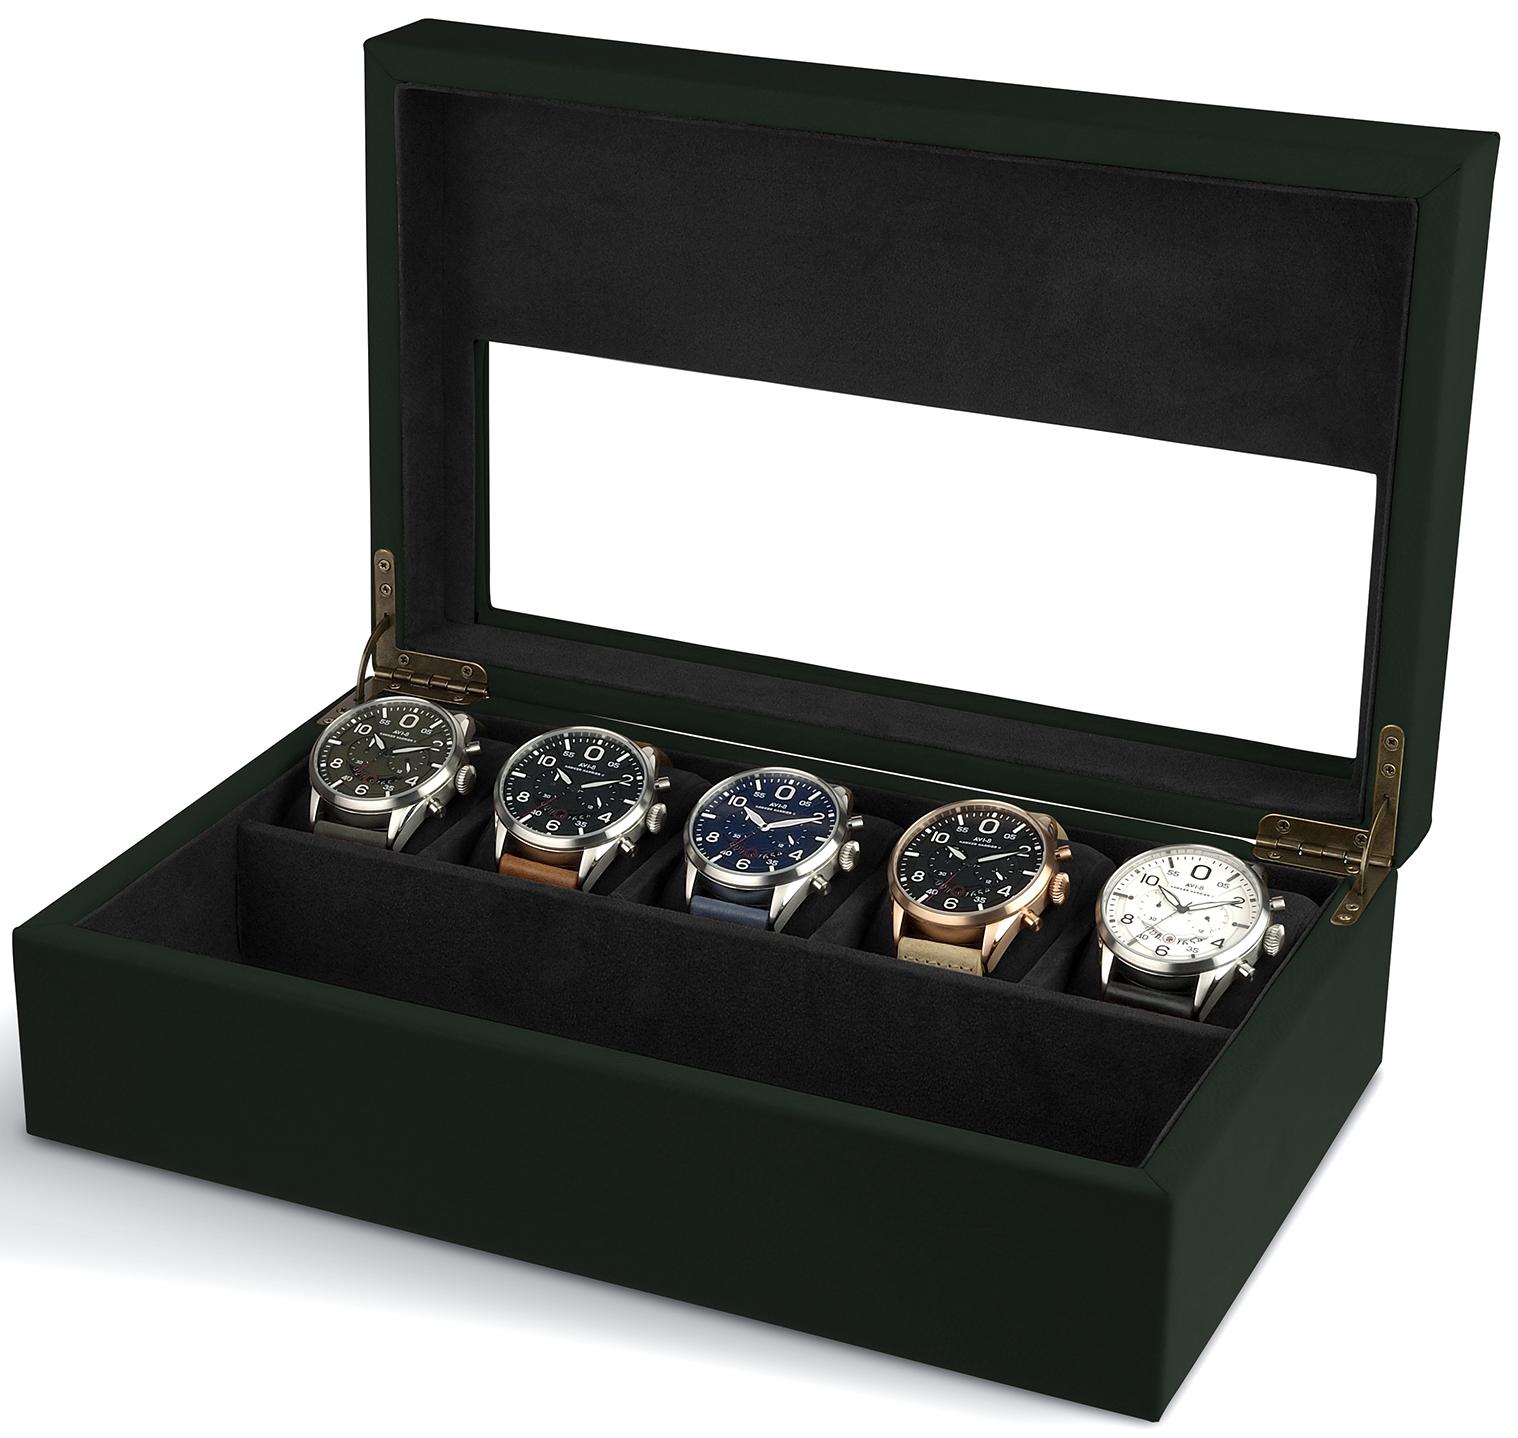 AVI-8 Collector Box, $50